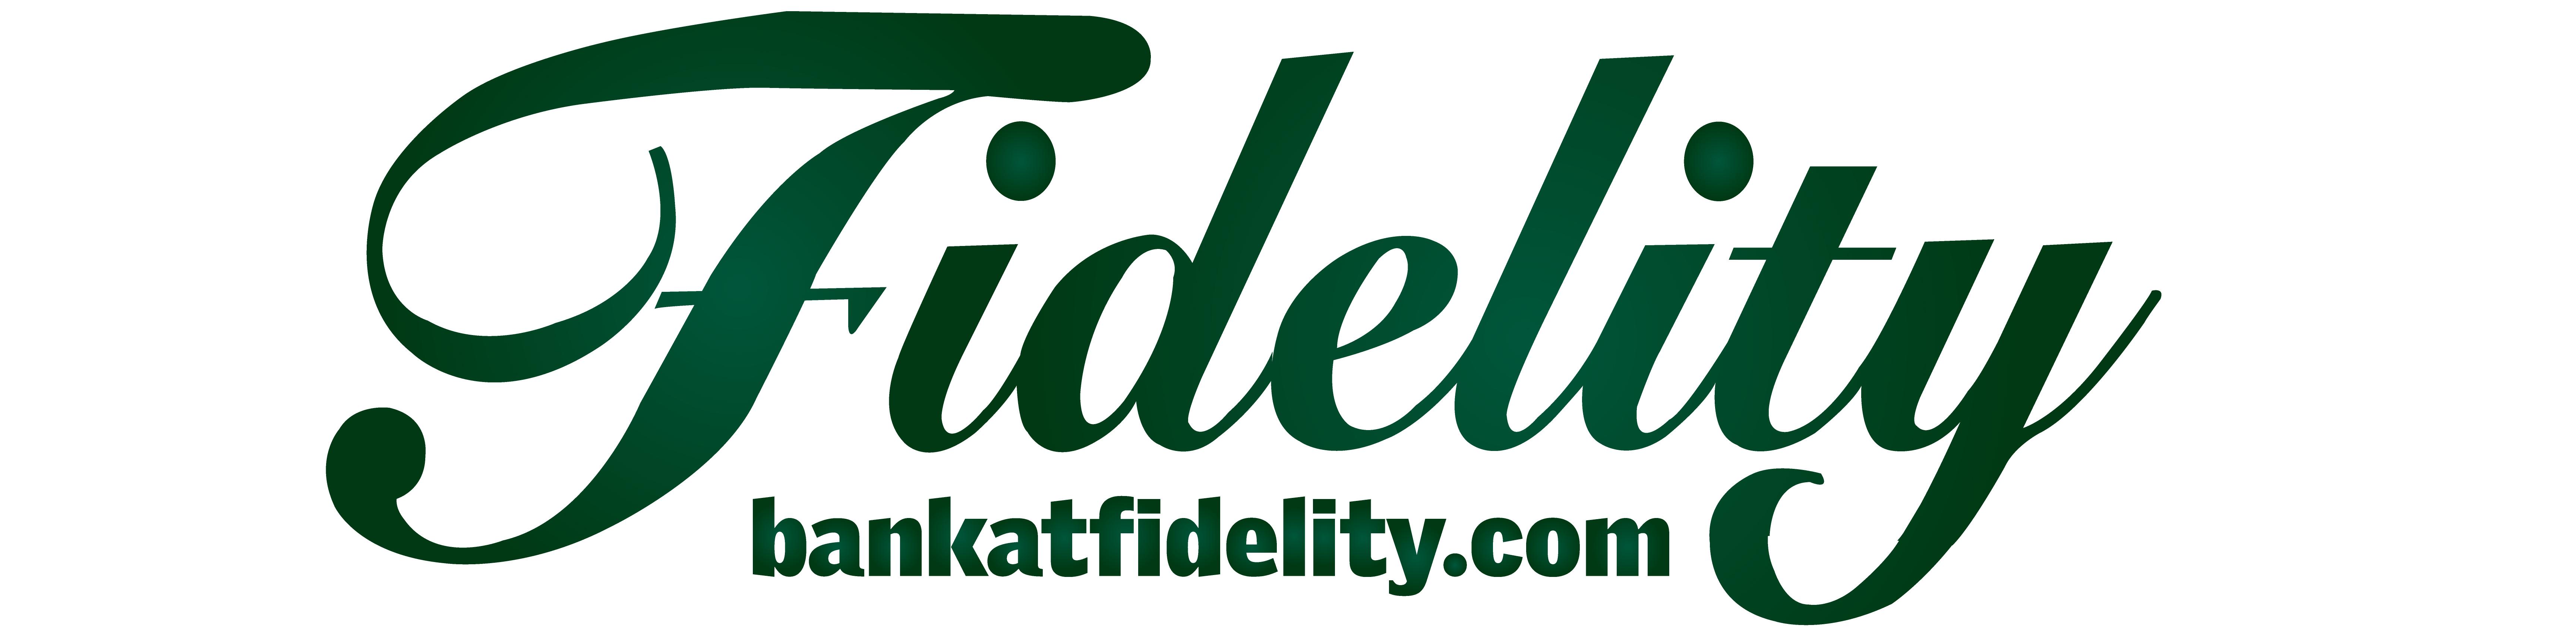 FDD-logo-jpeg-large